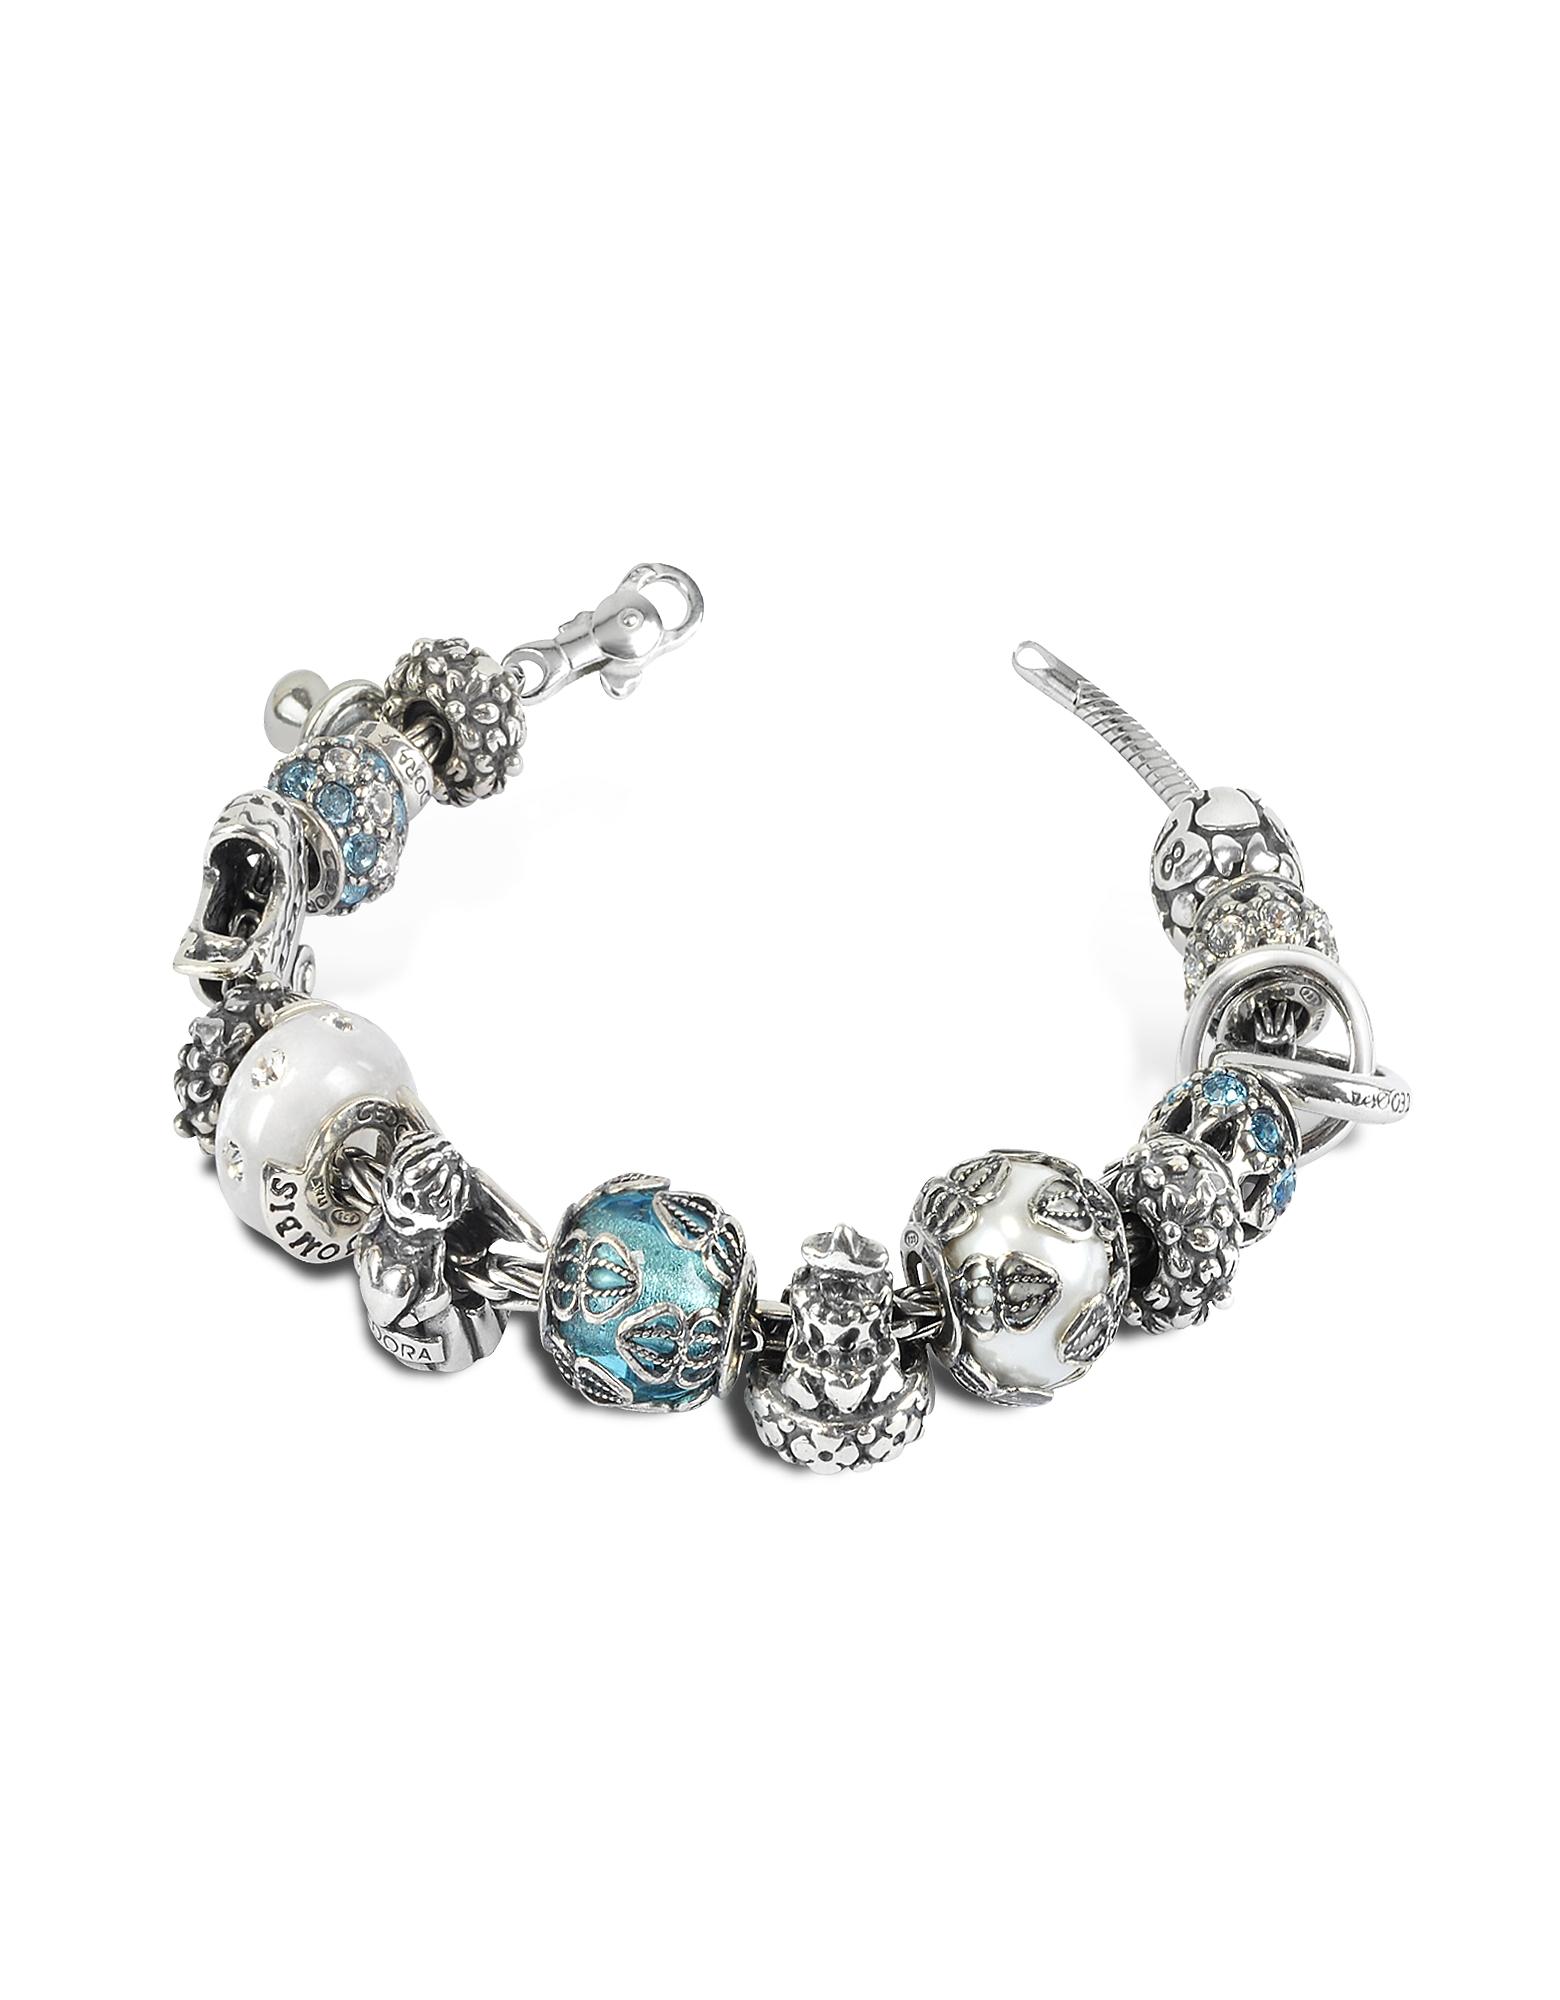 Tedora Bracelets, Sterling Silver Special Moments Bracelet